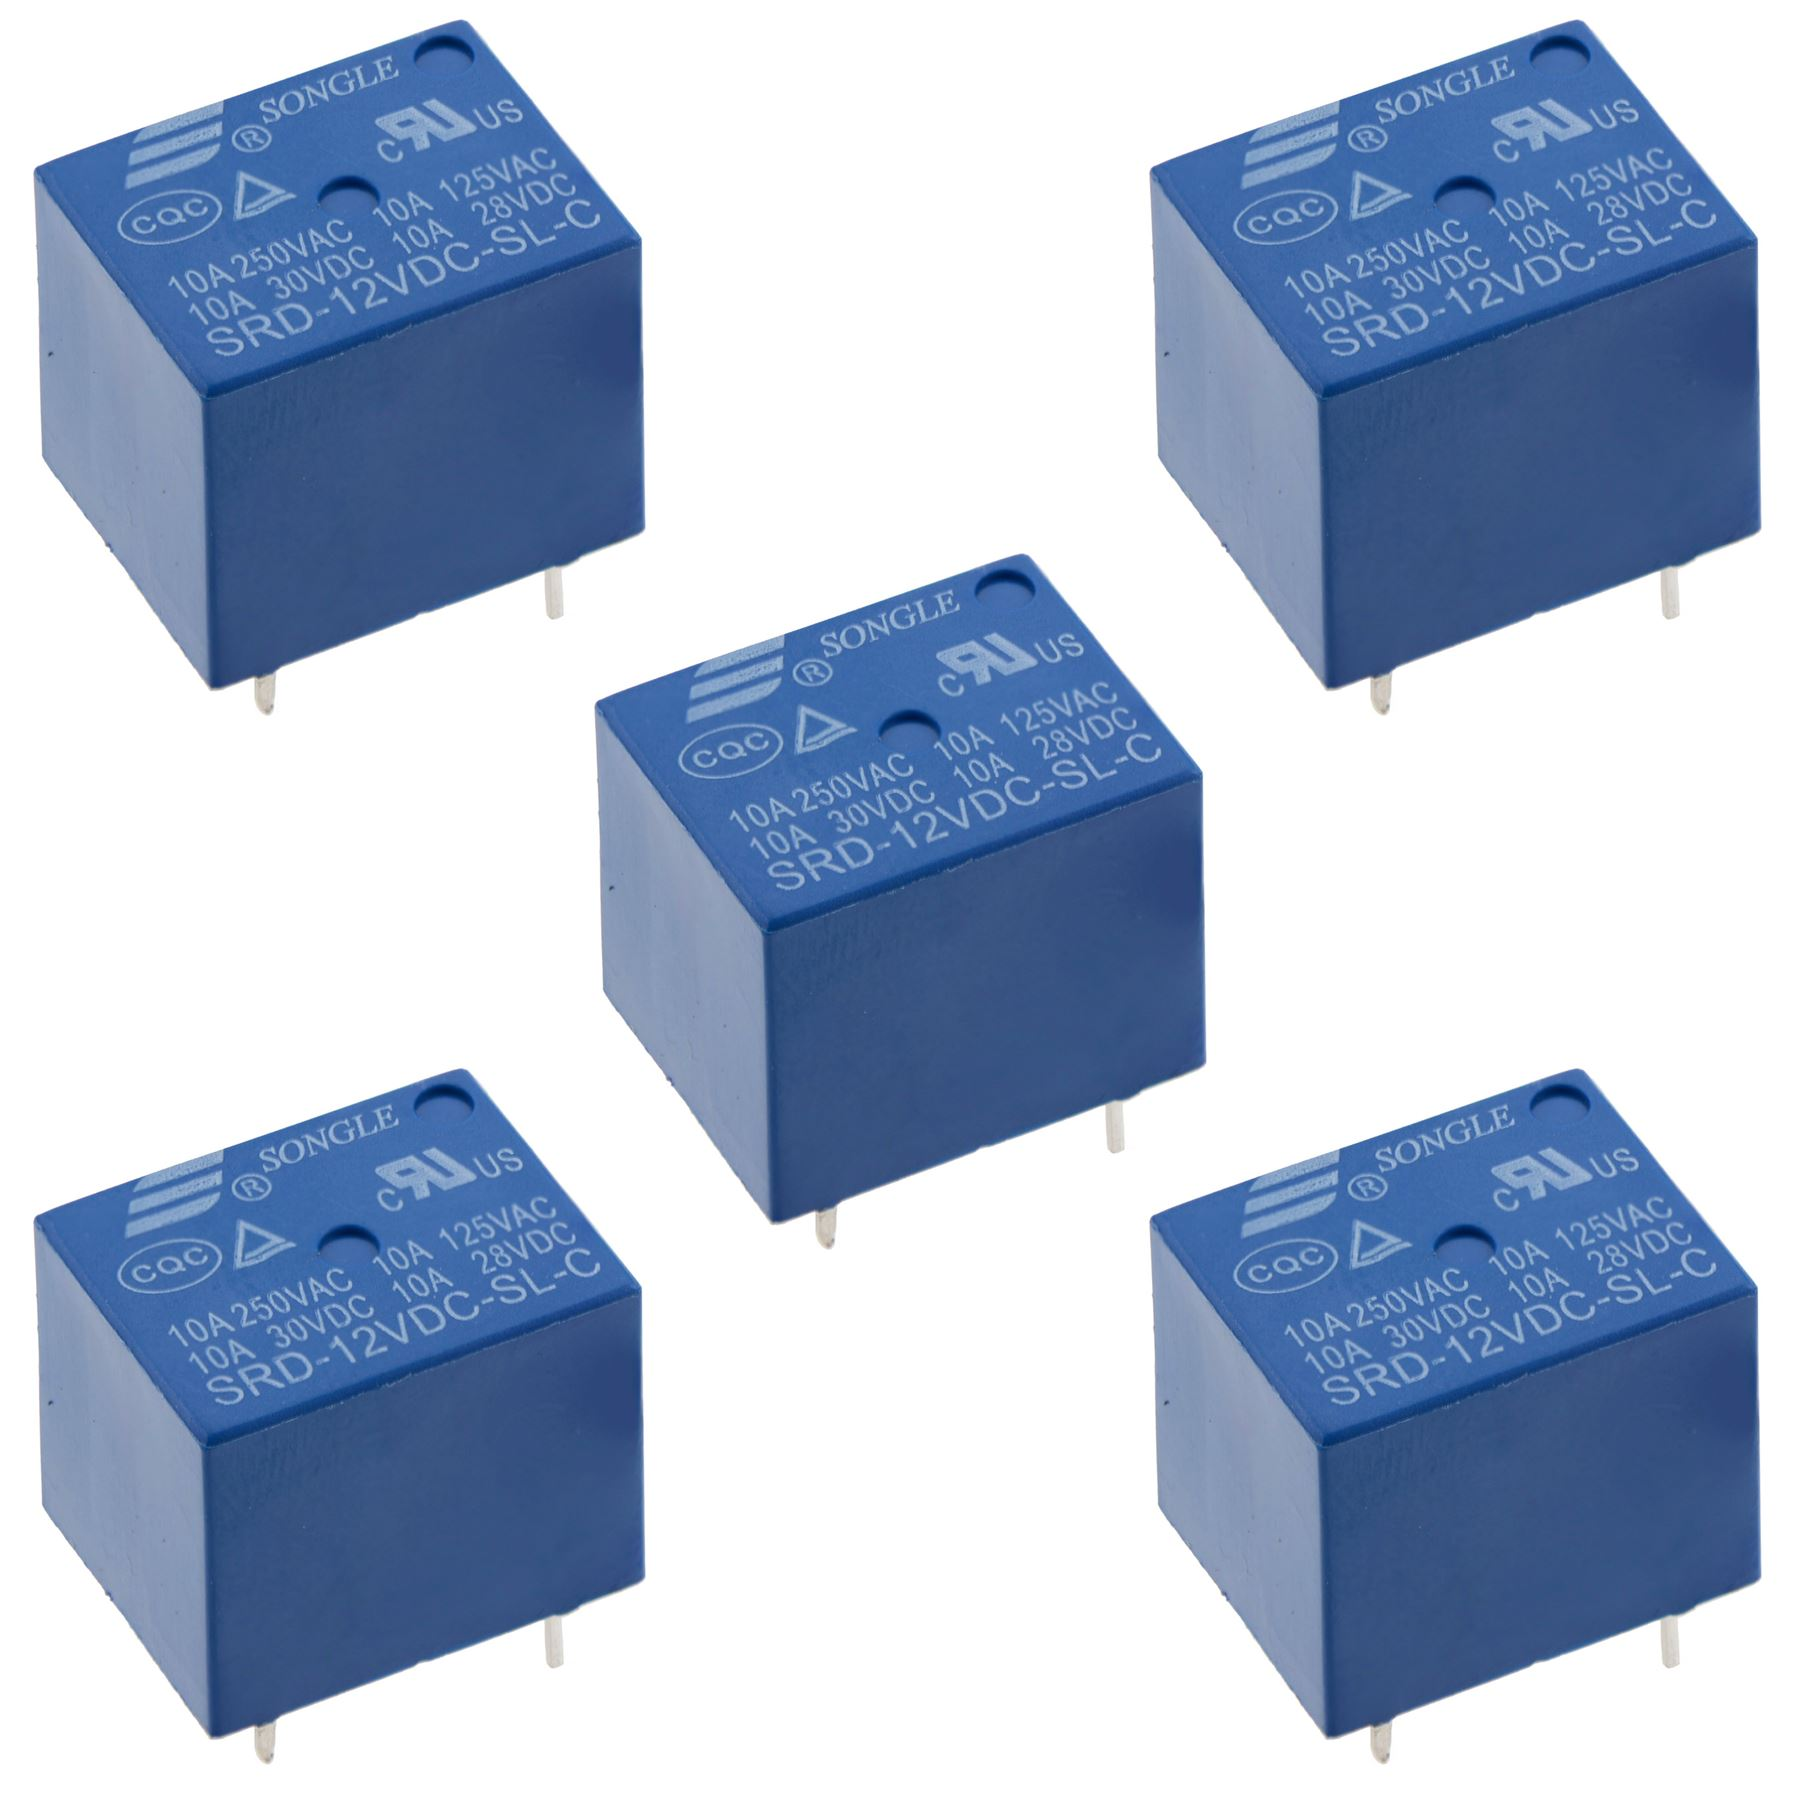 5V / 12V / 24V Mini Songle Relay SPDT 5-Pins PCB - 1st Class   eBay